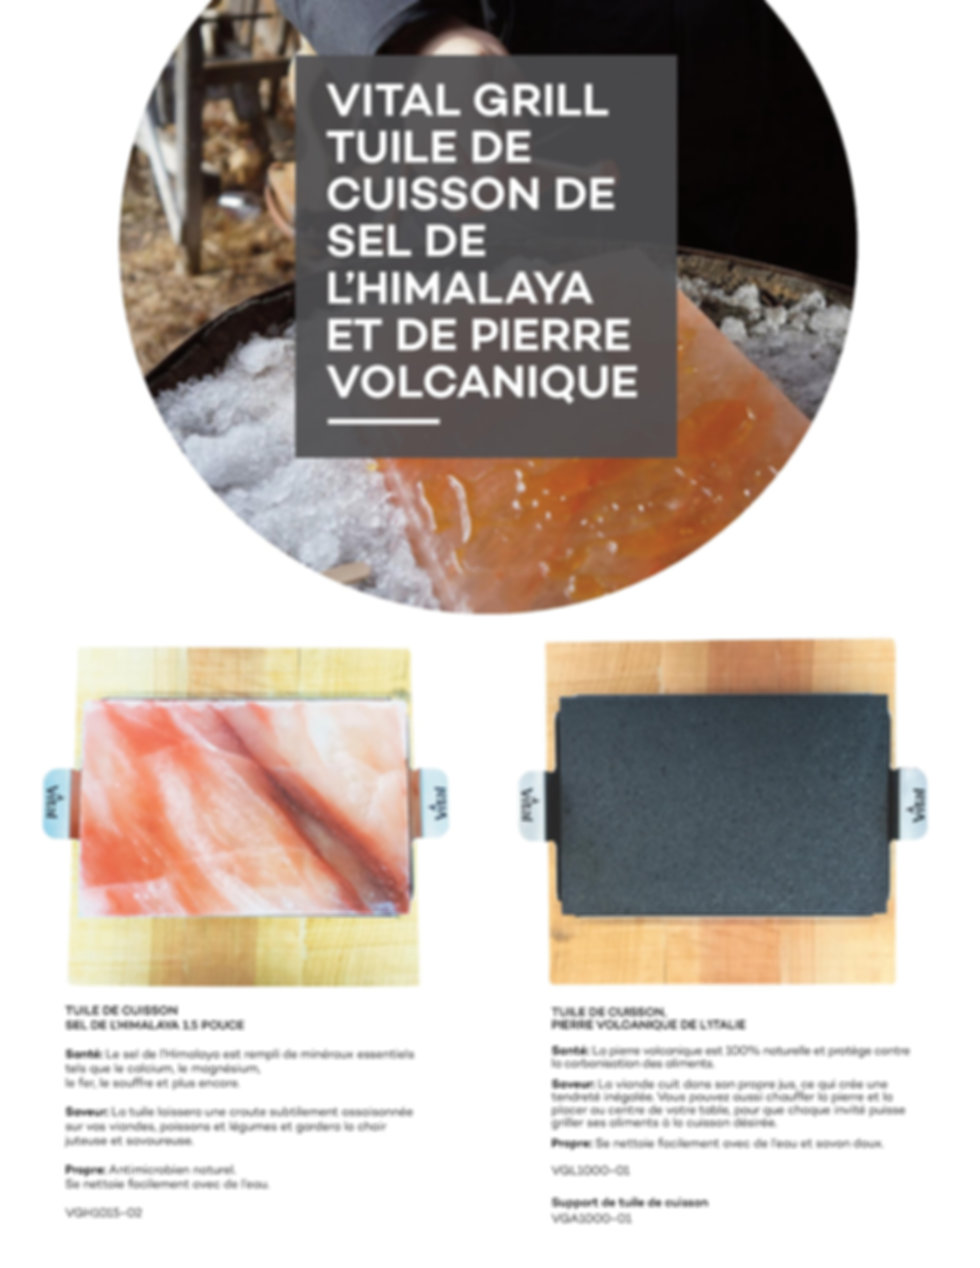 Vital Grill-Tuiles de cuisson.jpg